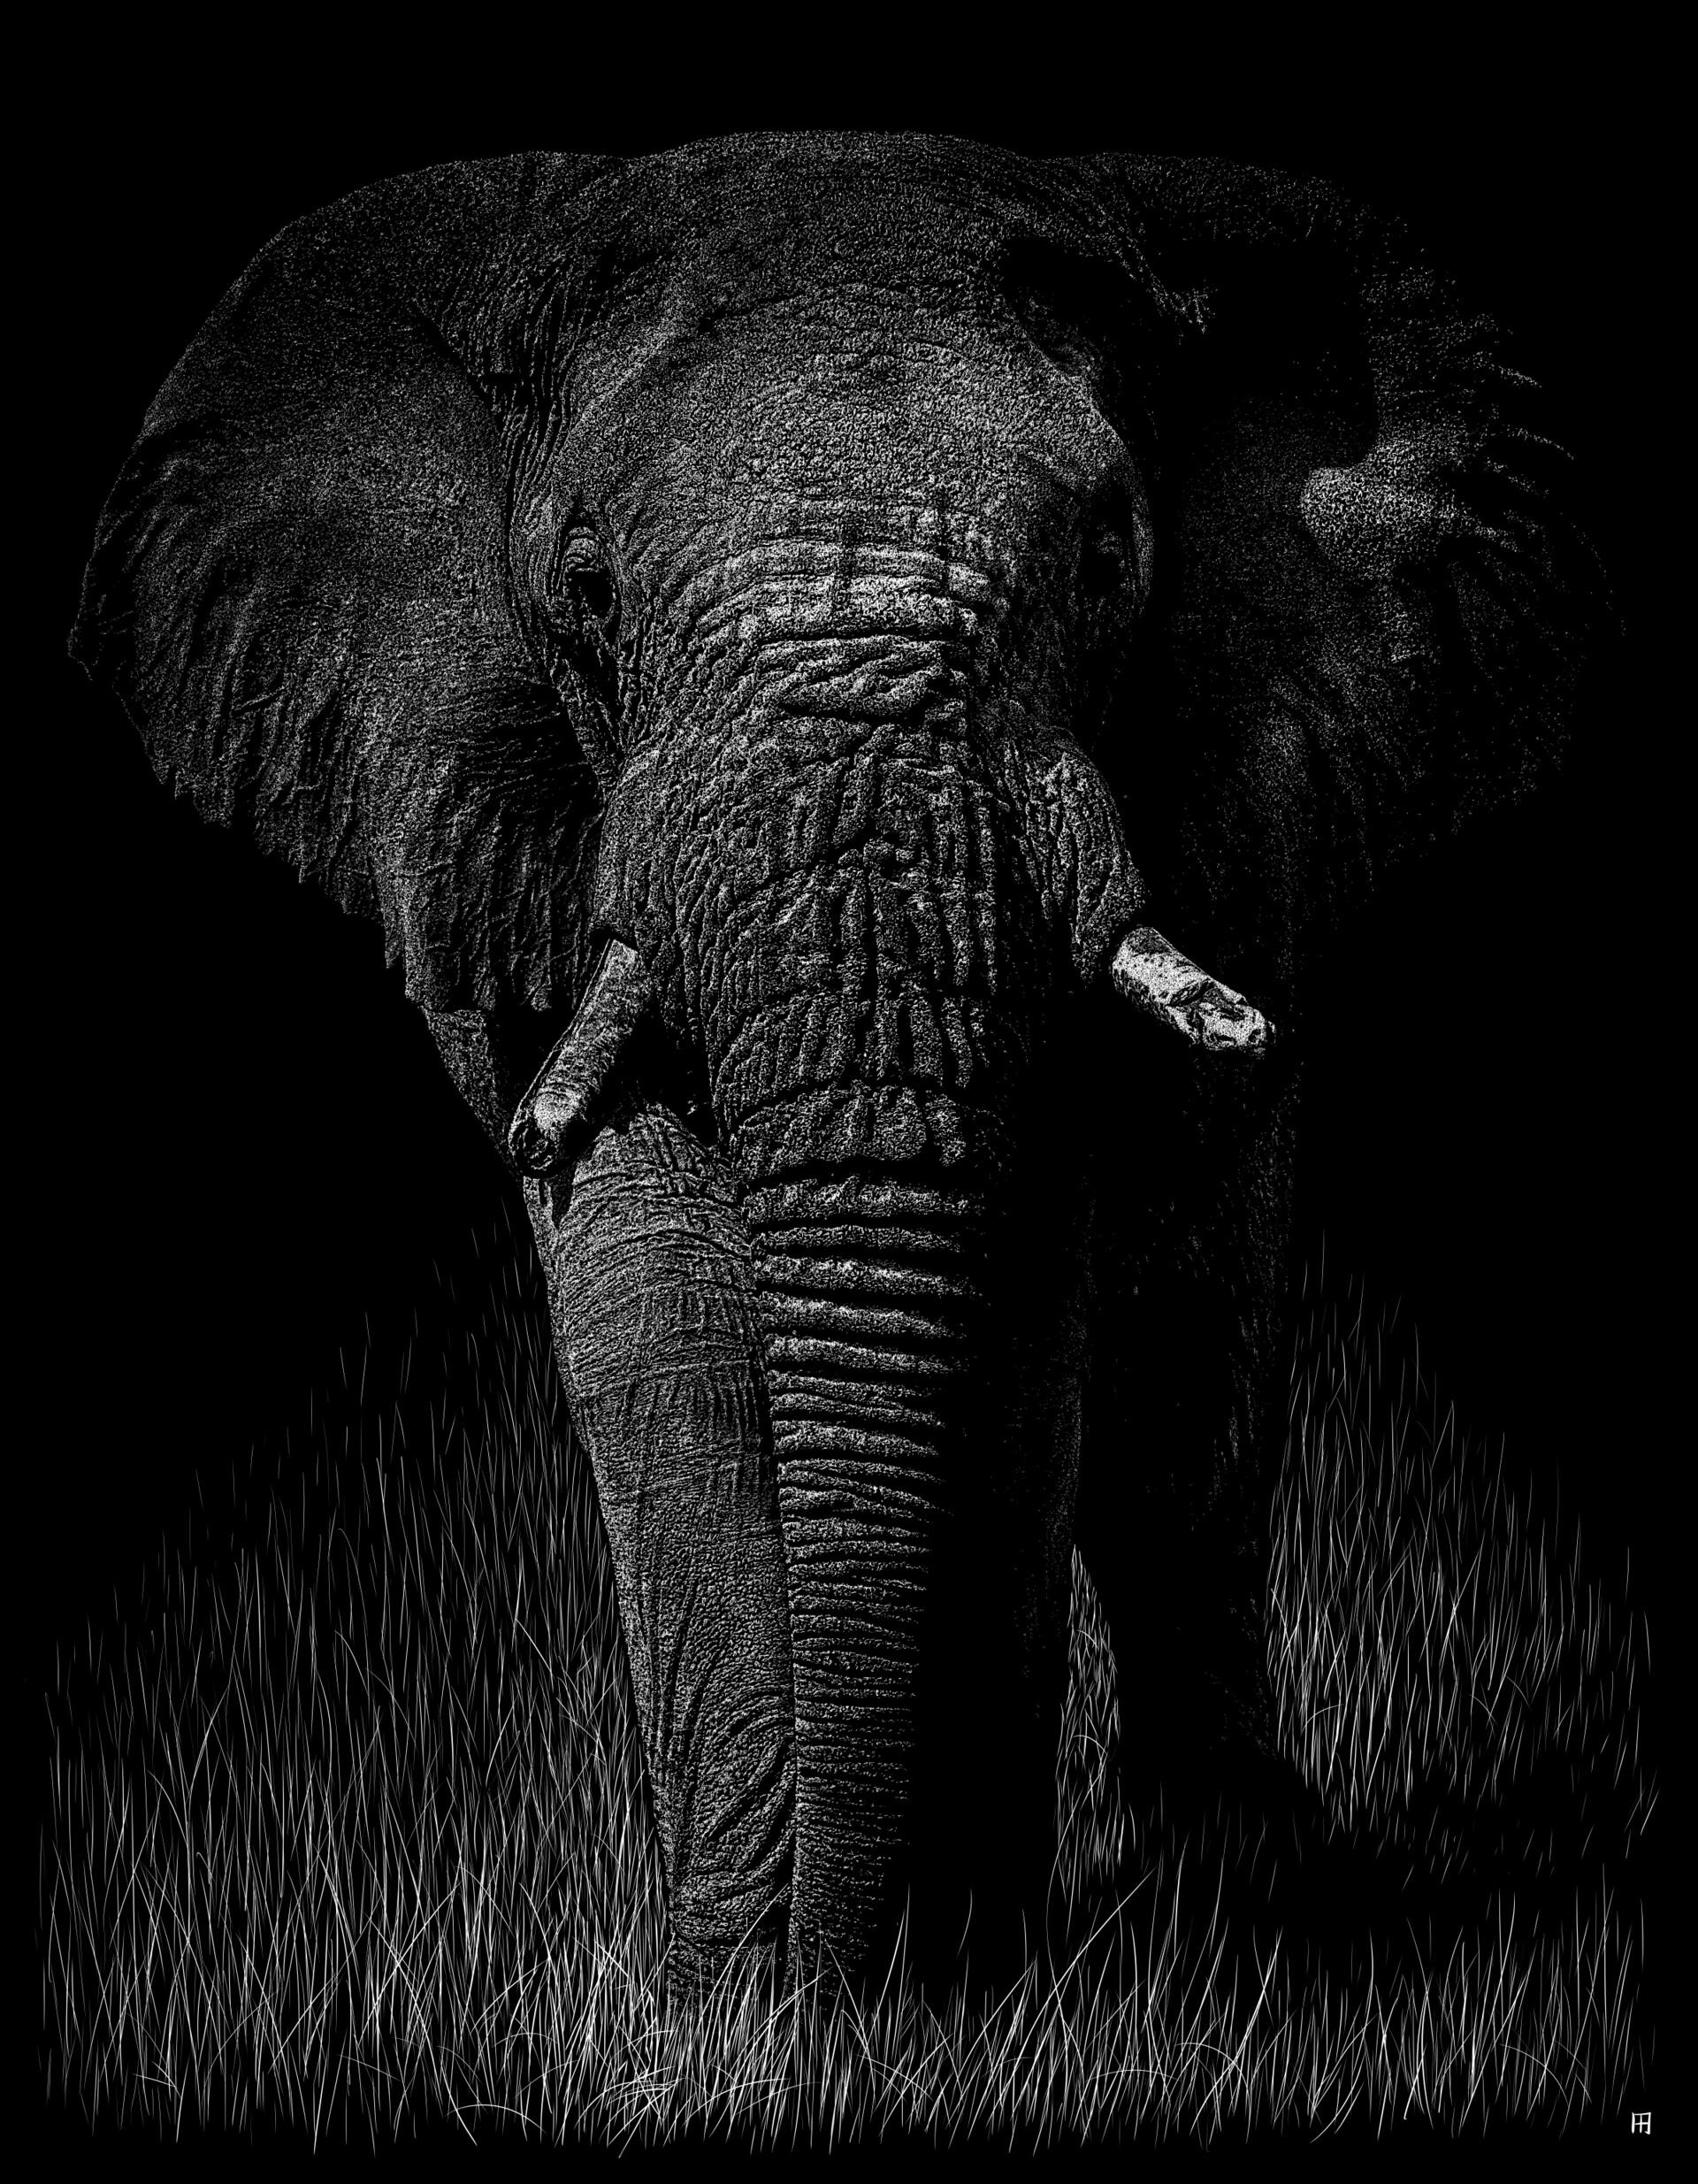 elephantidae II Digital scratchboard, july 2019